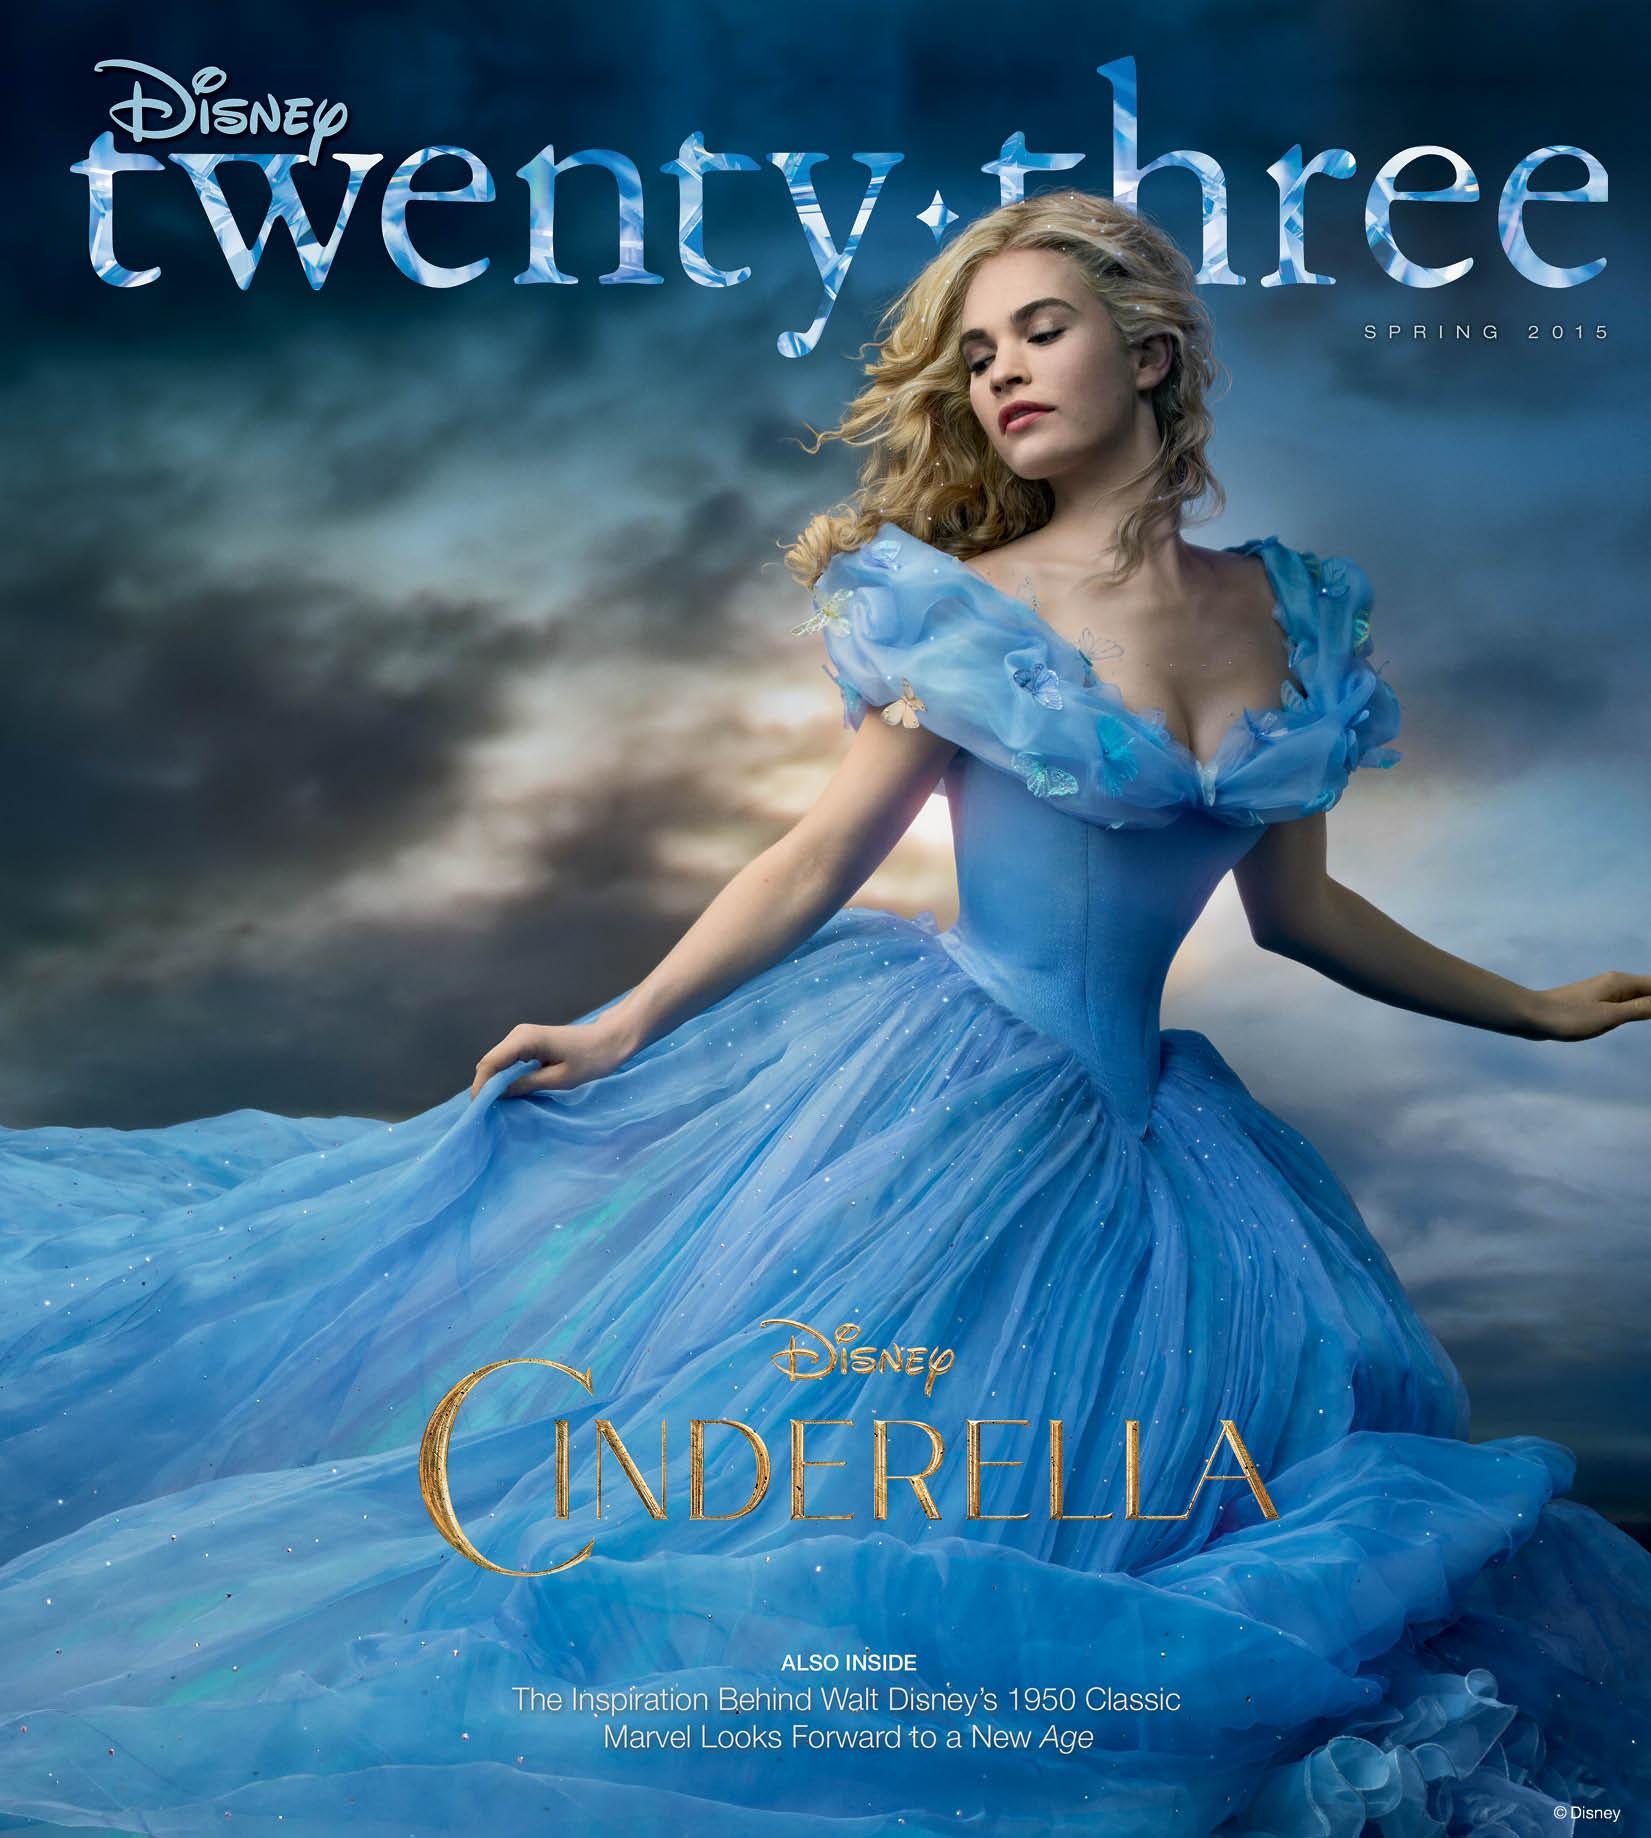 DisneyTwentyThree_02_2015_Cover